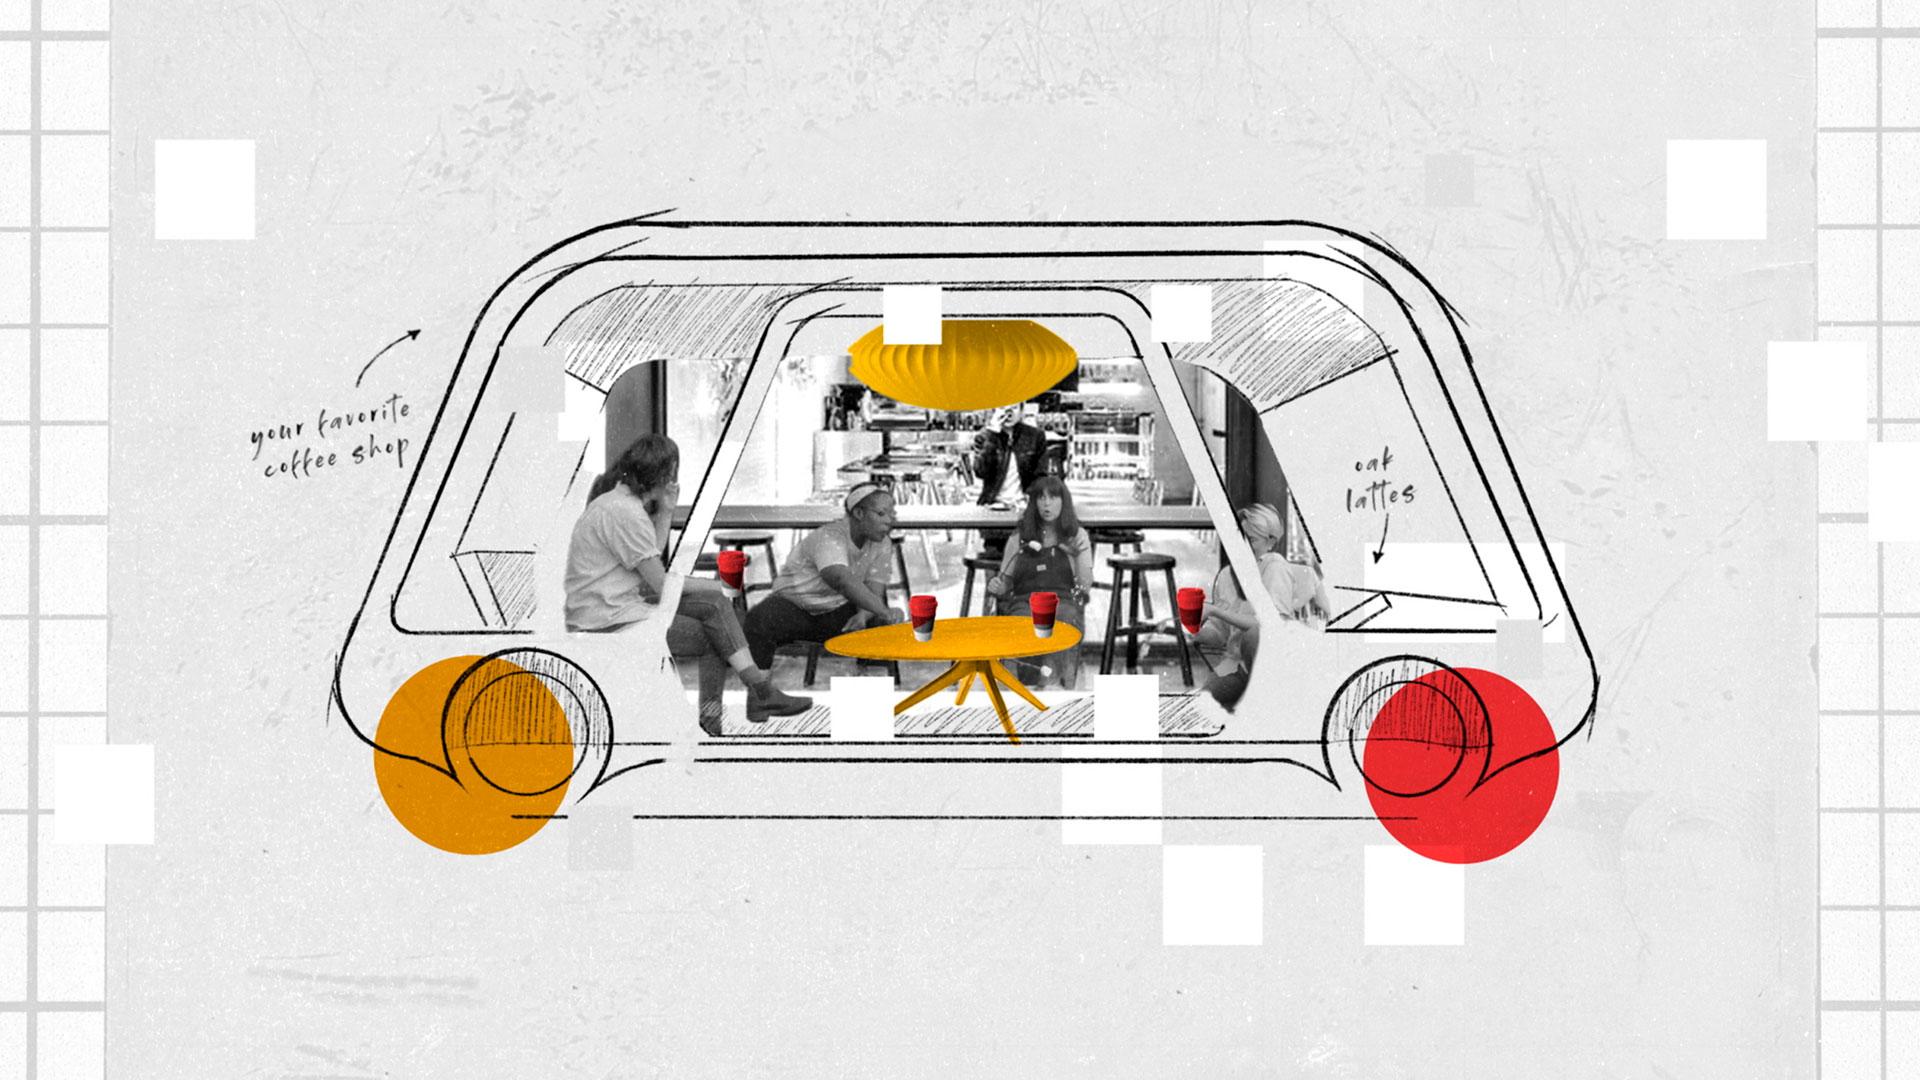 Imagen del vehículo Lexus TED